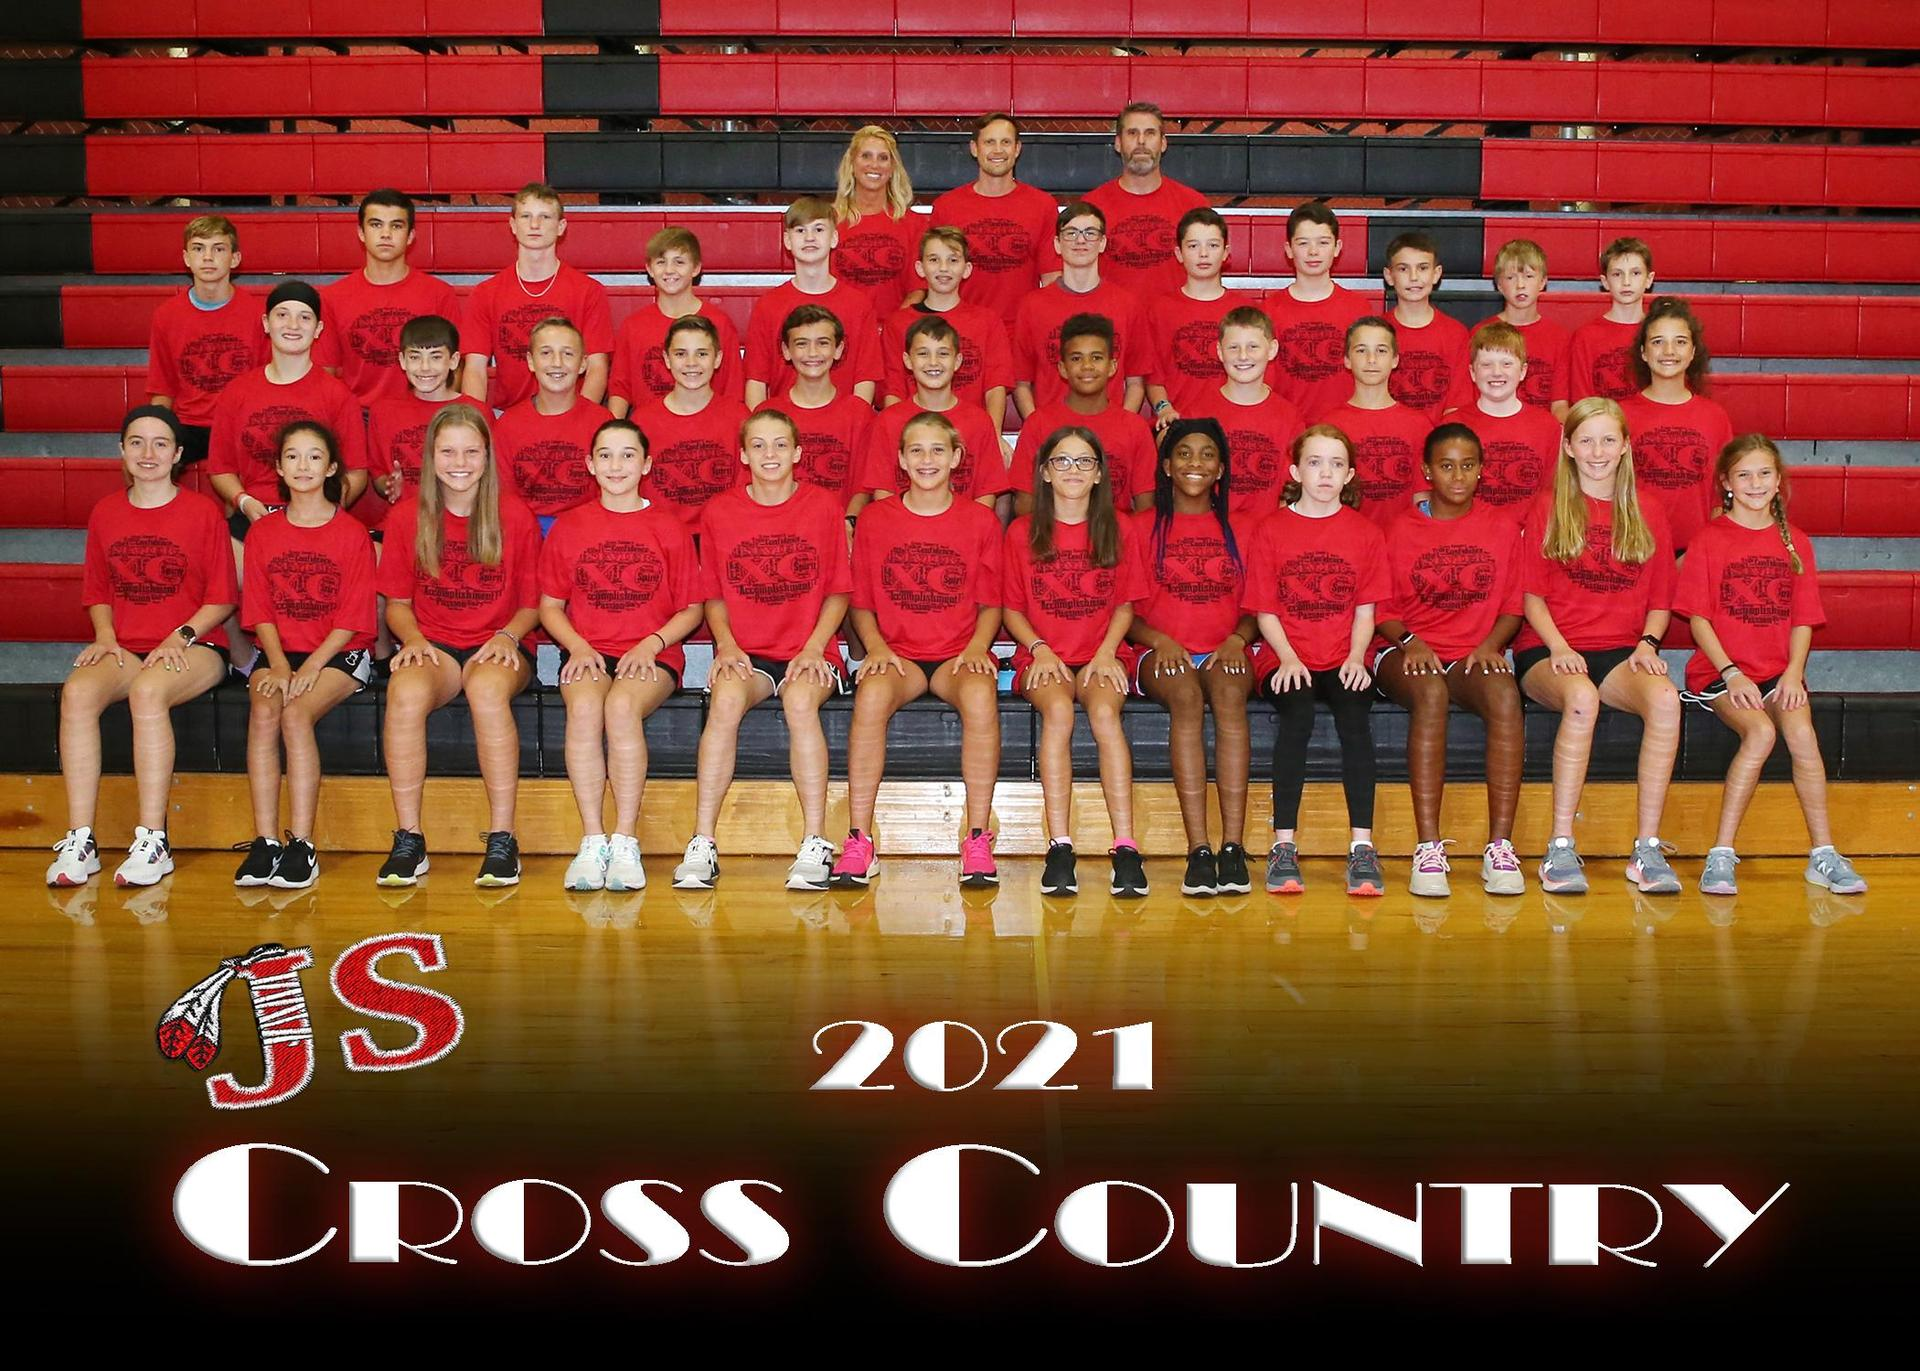 2021 Cross Country